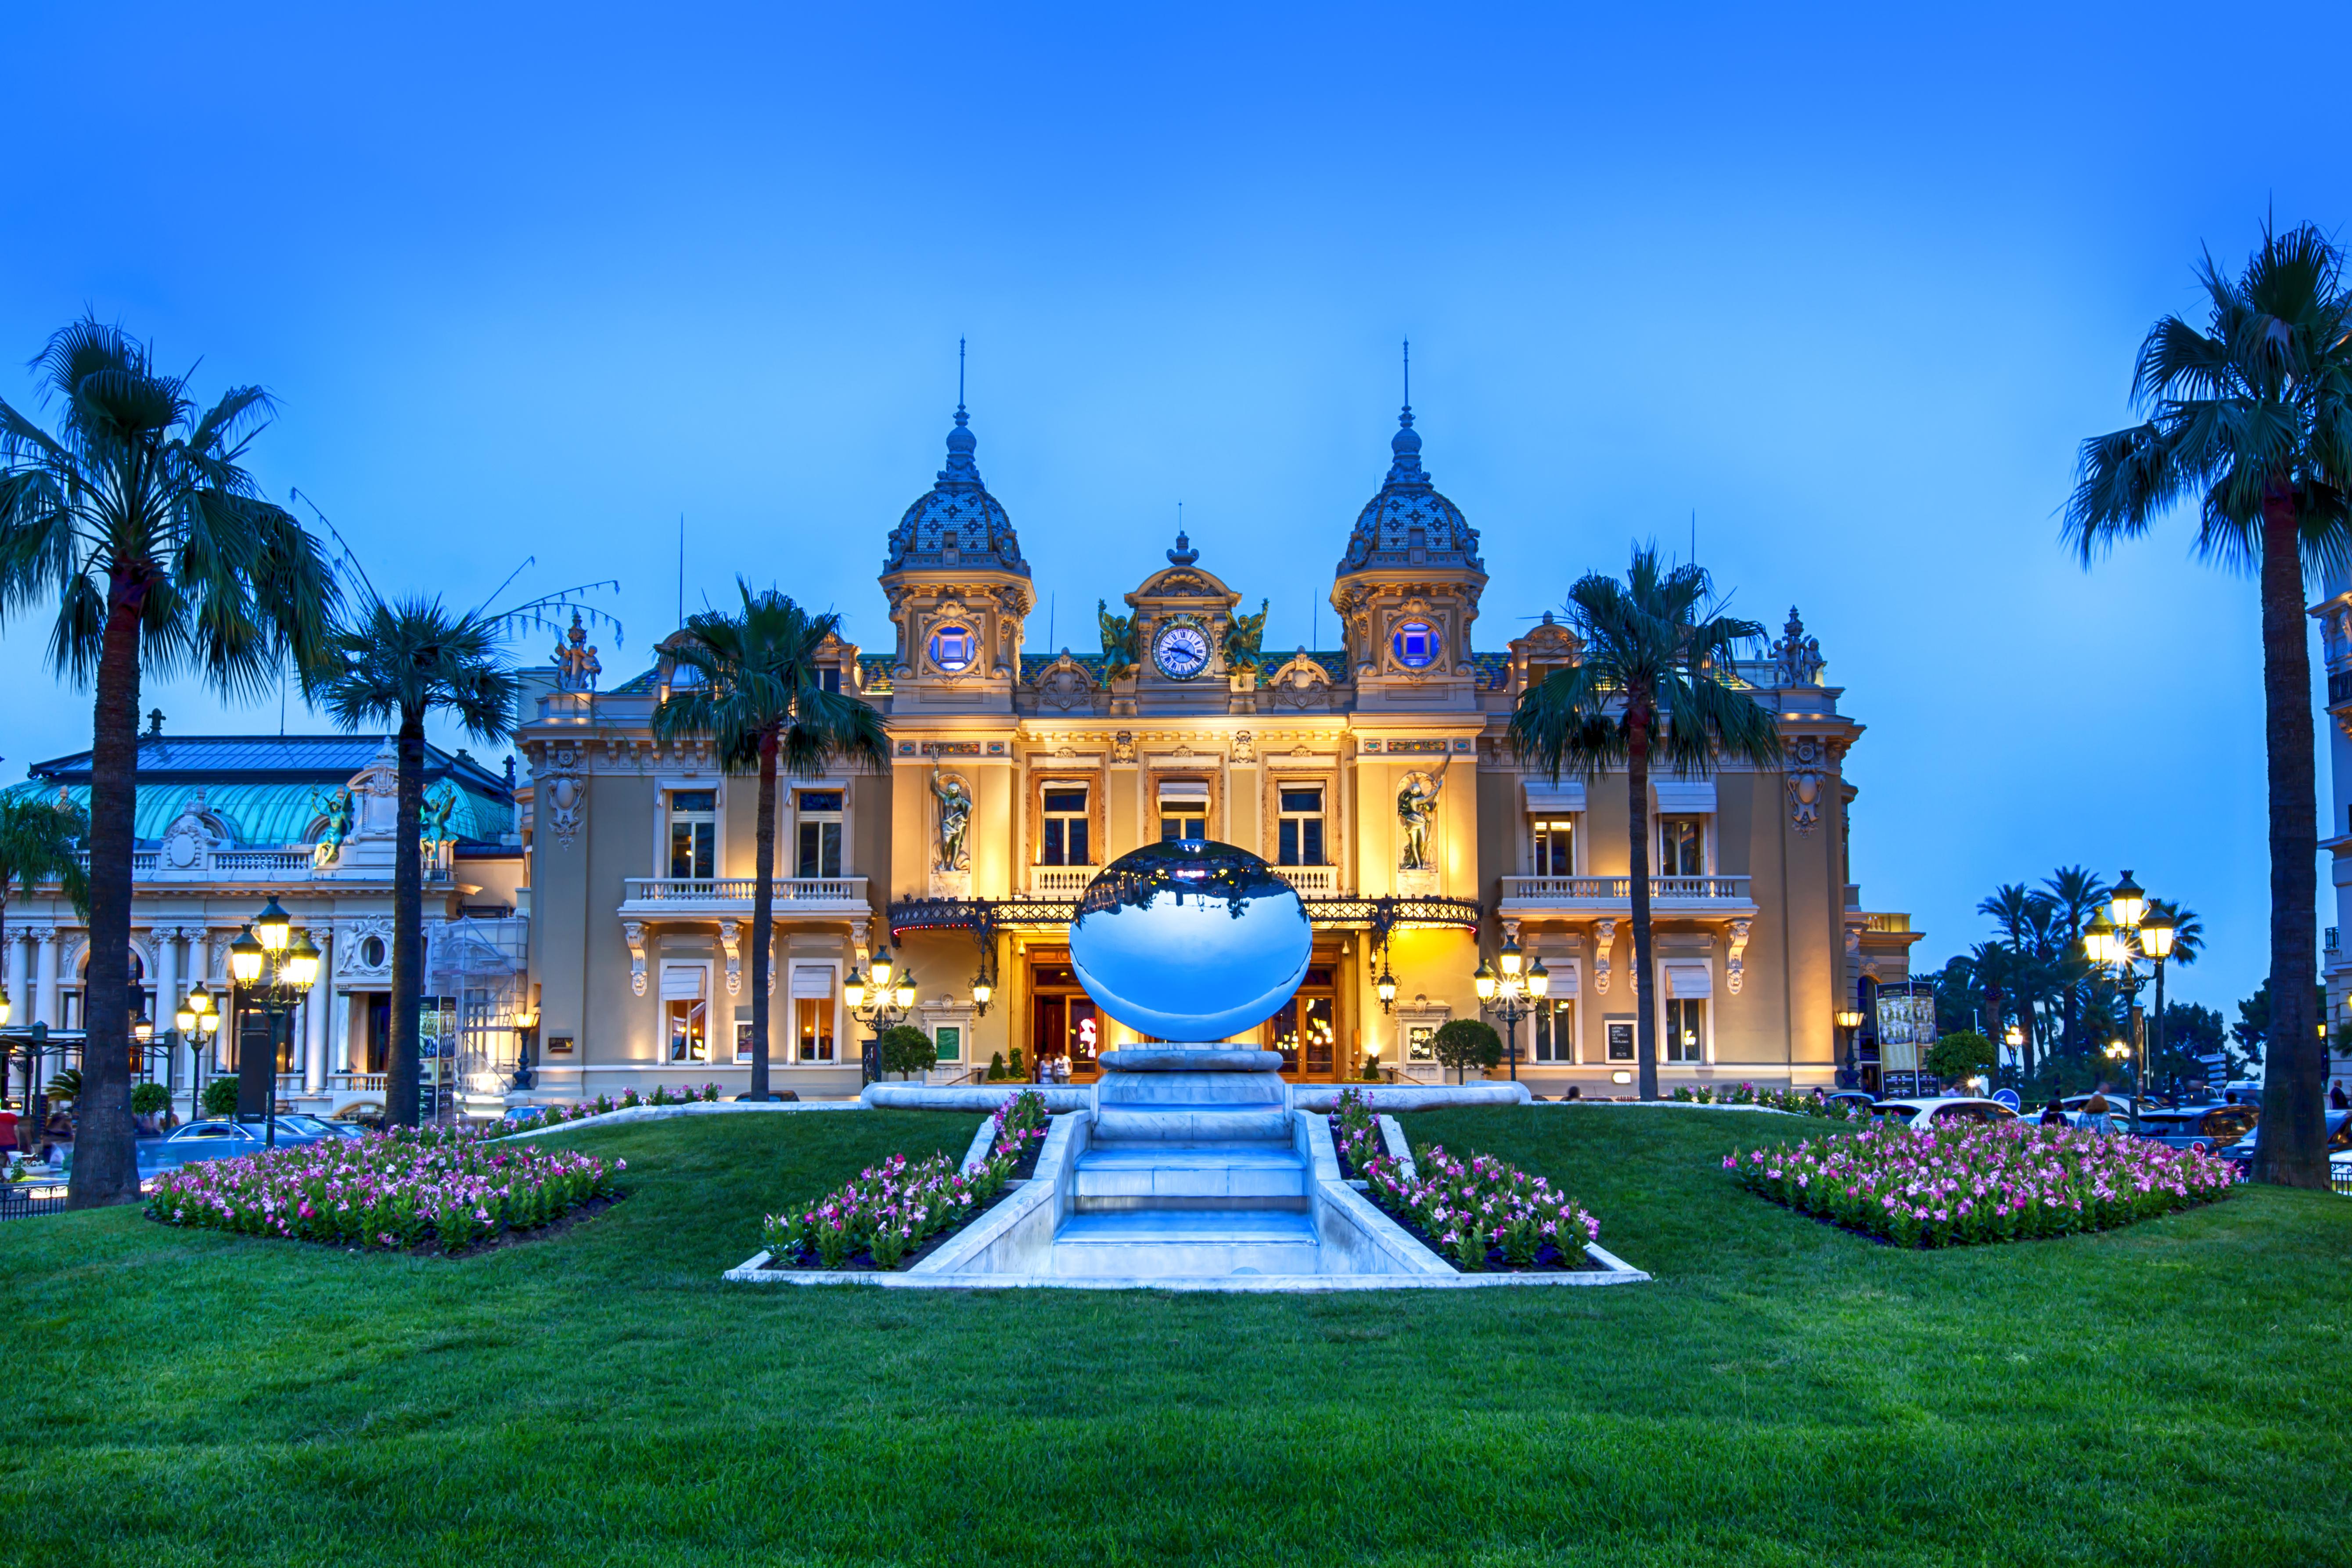 Carlo casino gambling addiction articles